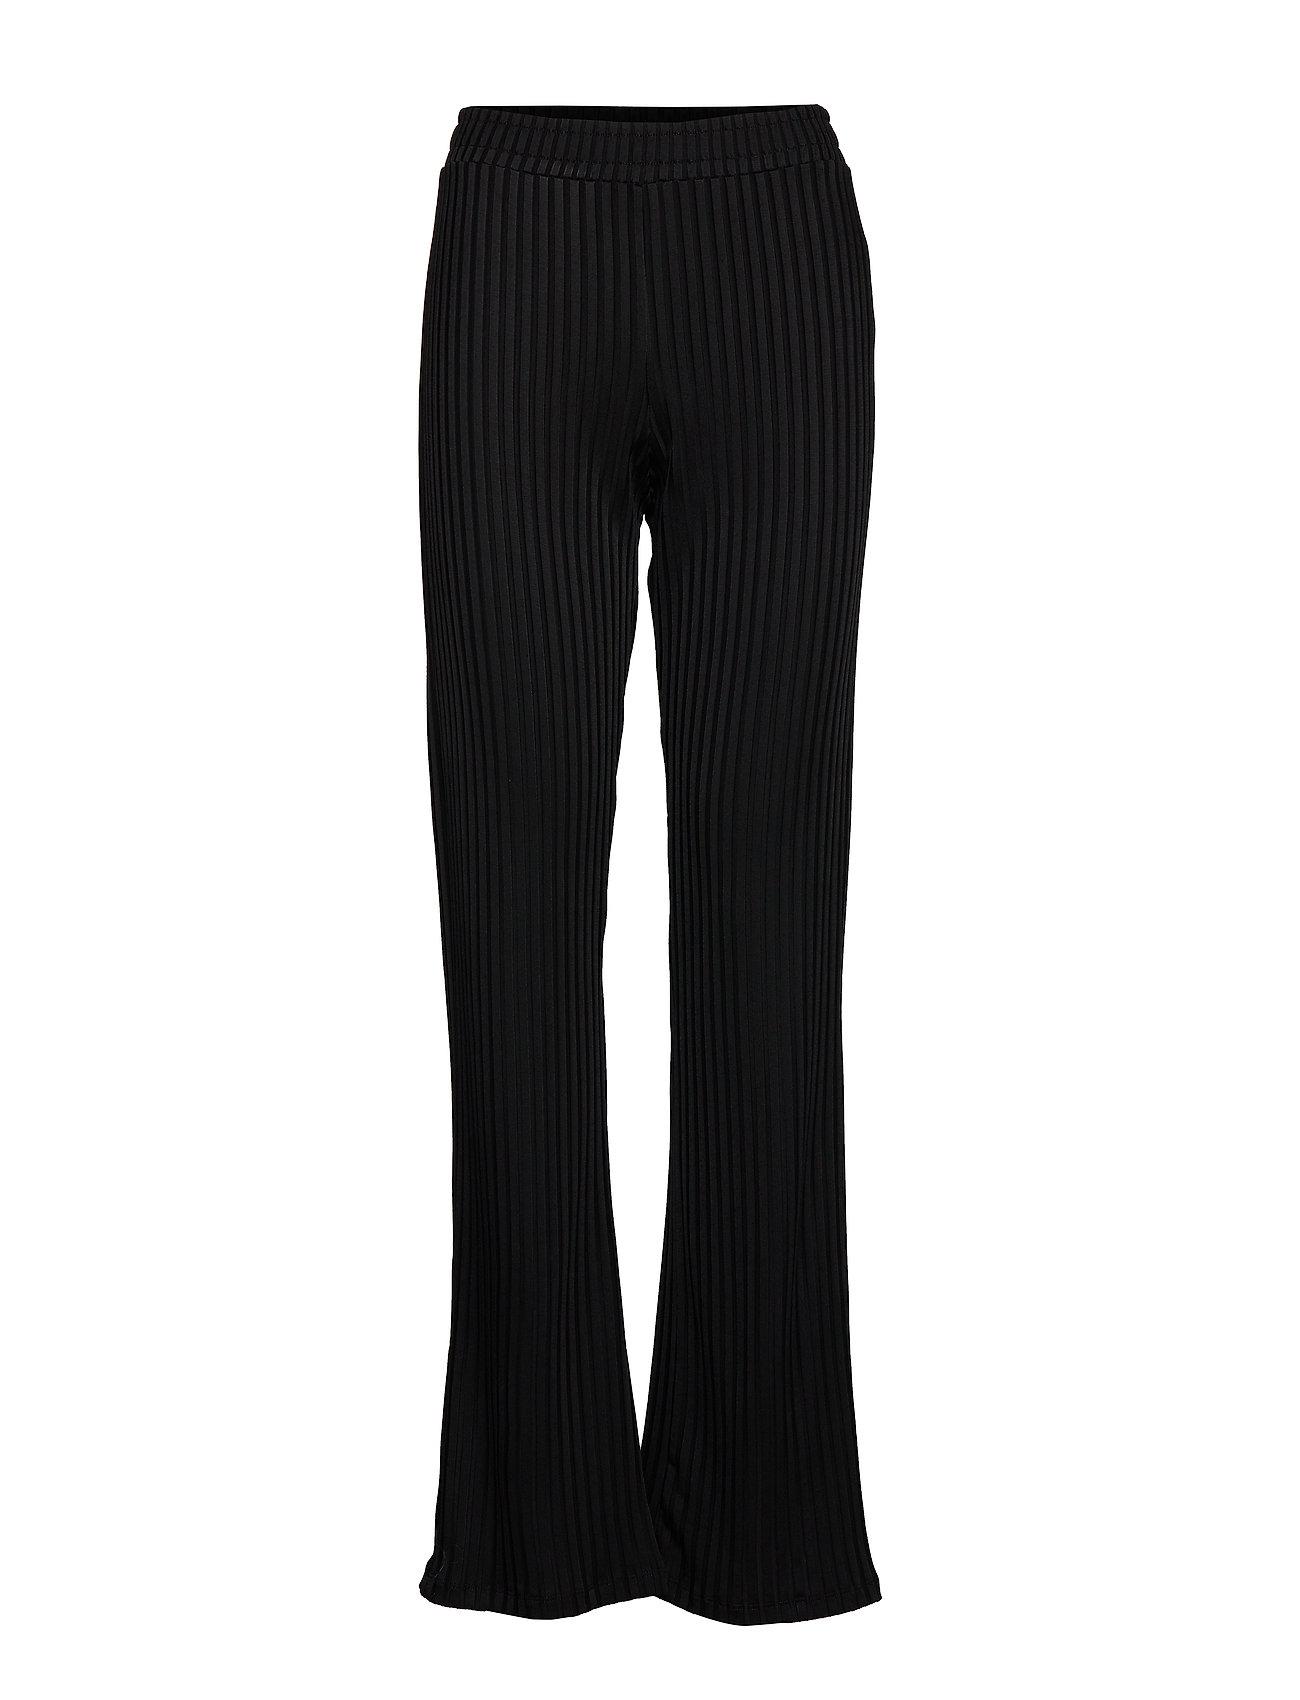 Birgitte Herskind Rome Pants - BLACK